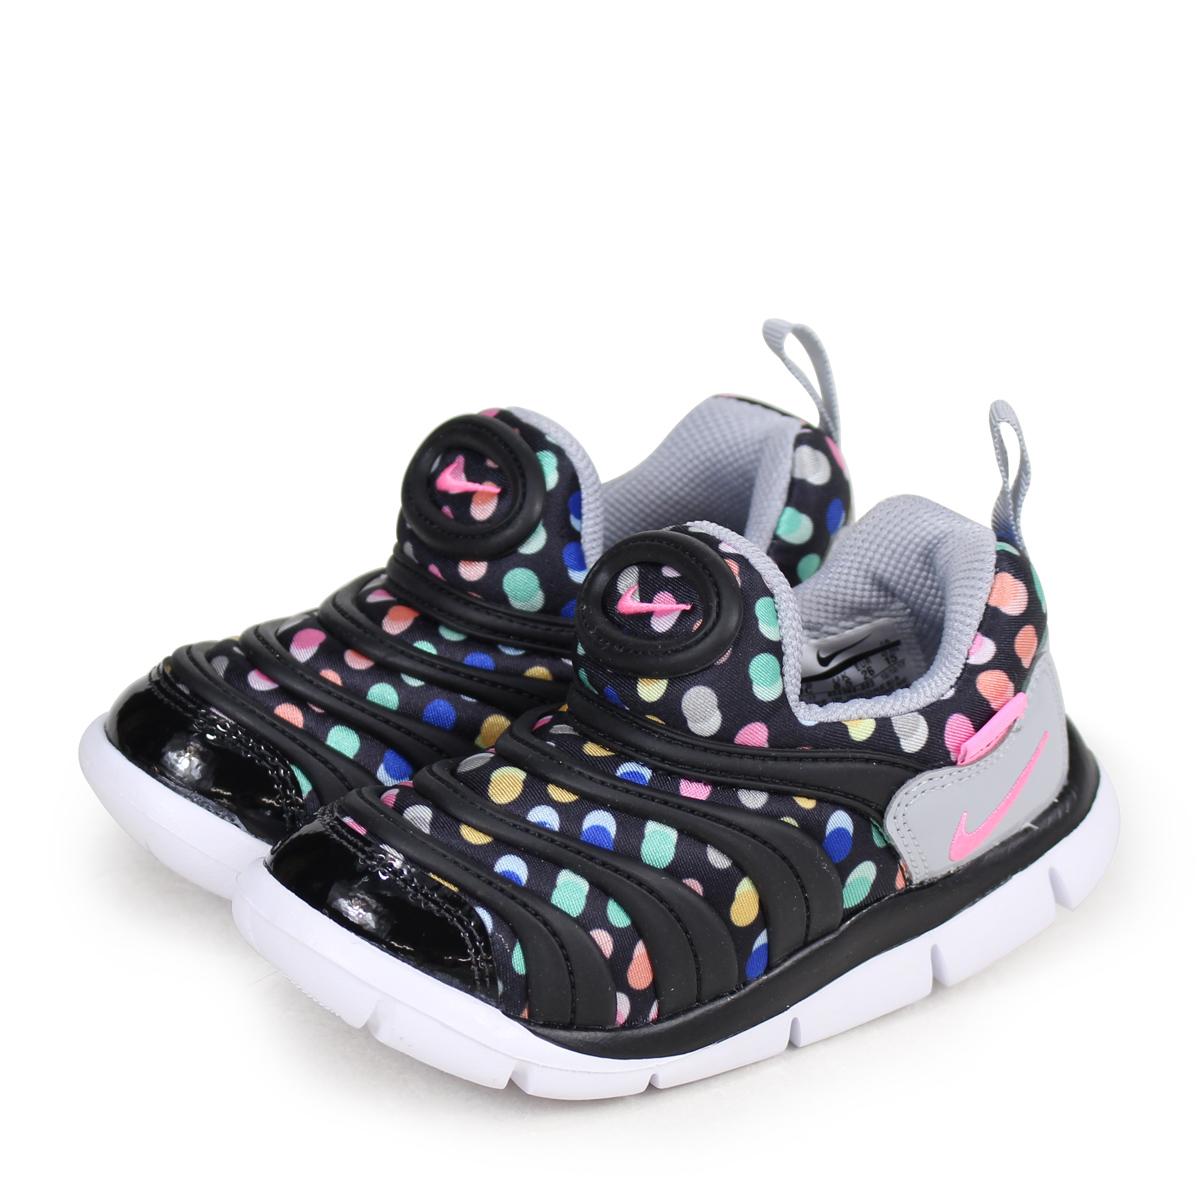 d39935a3afb19 ALLSPORTS  NIKE DYNAMO FREE PRINT TD Nike dynamo-free baby sneakers ...